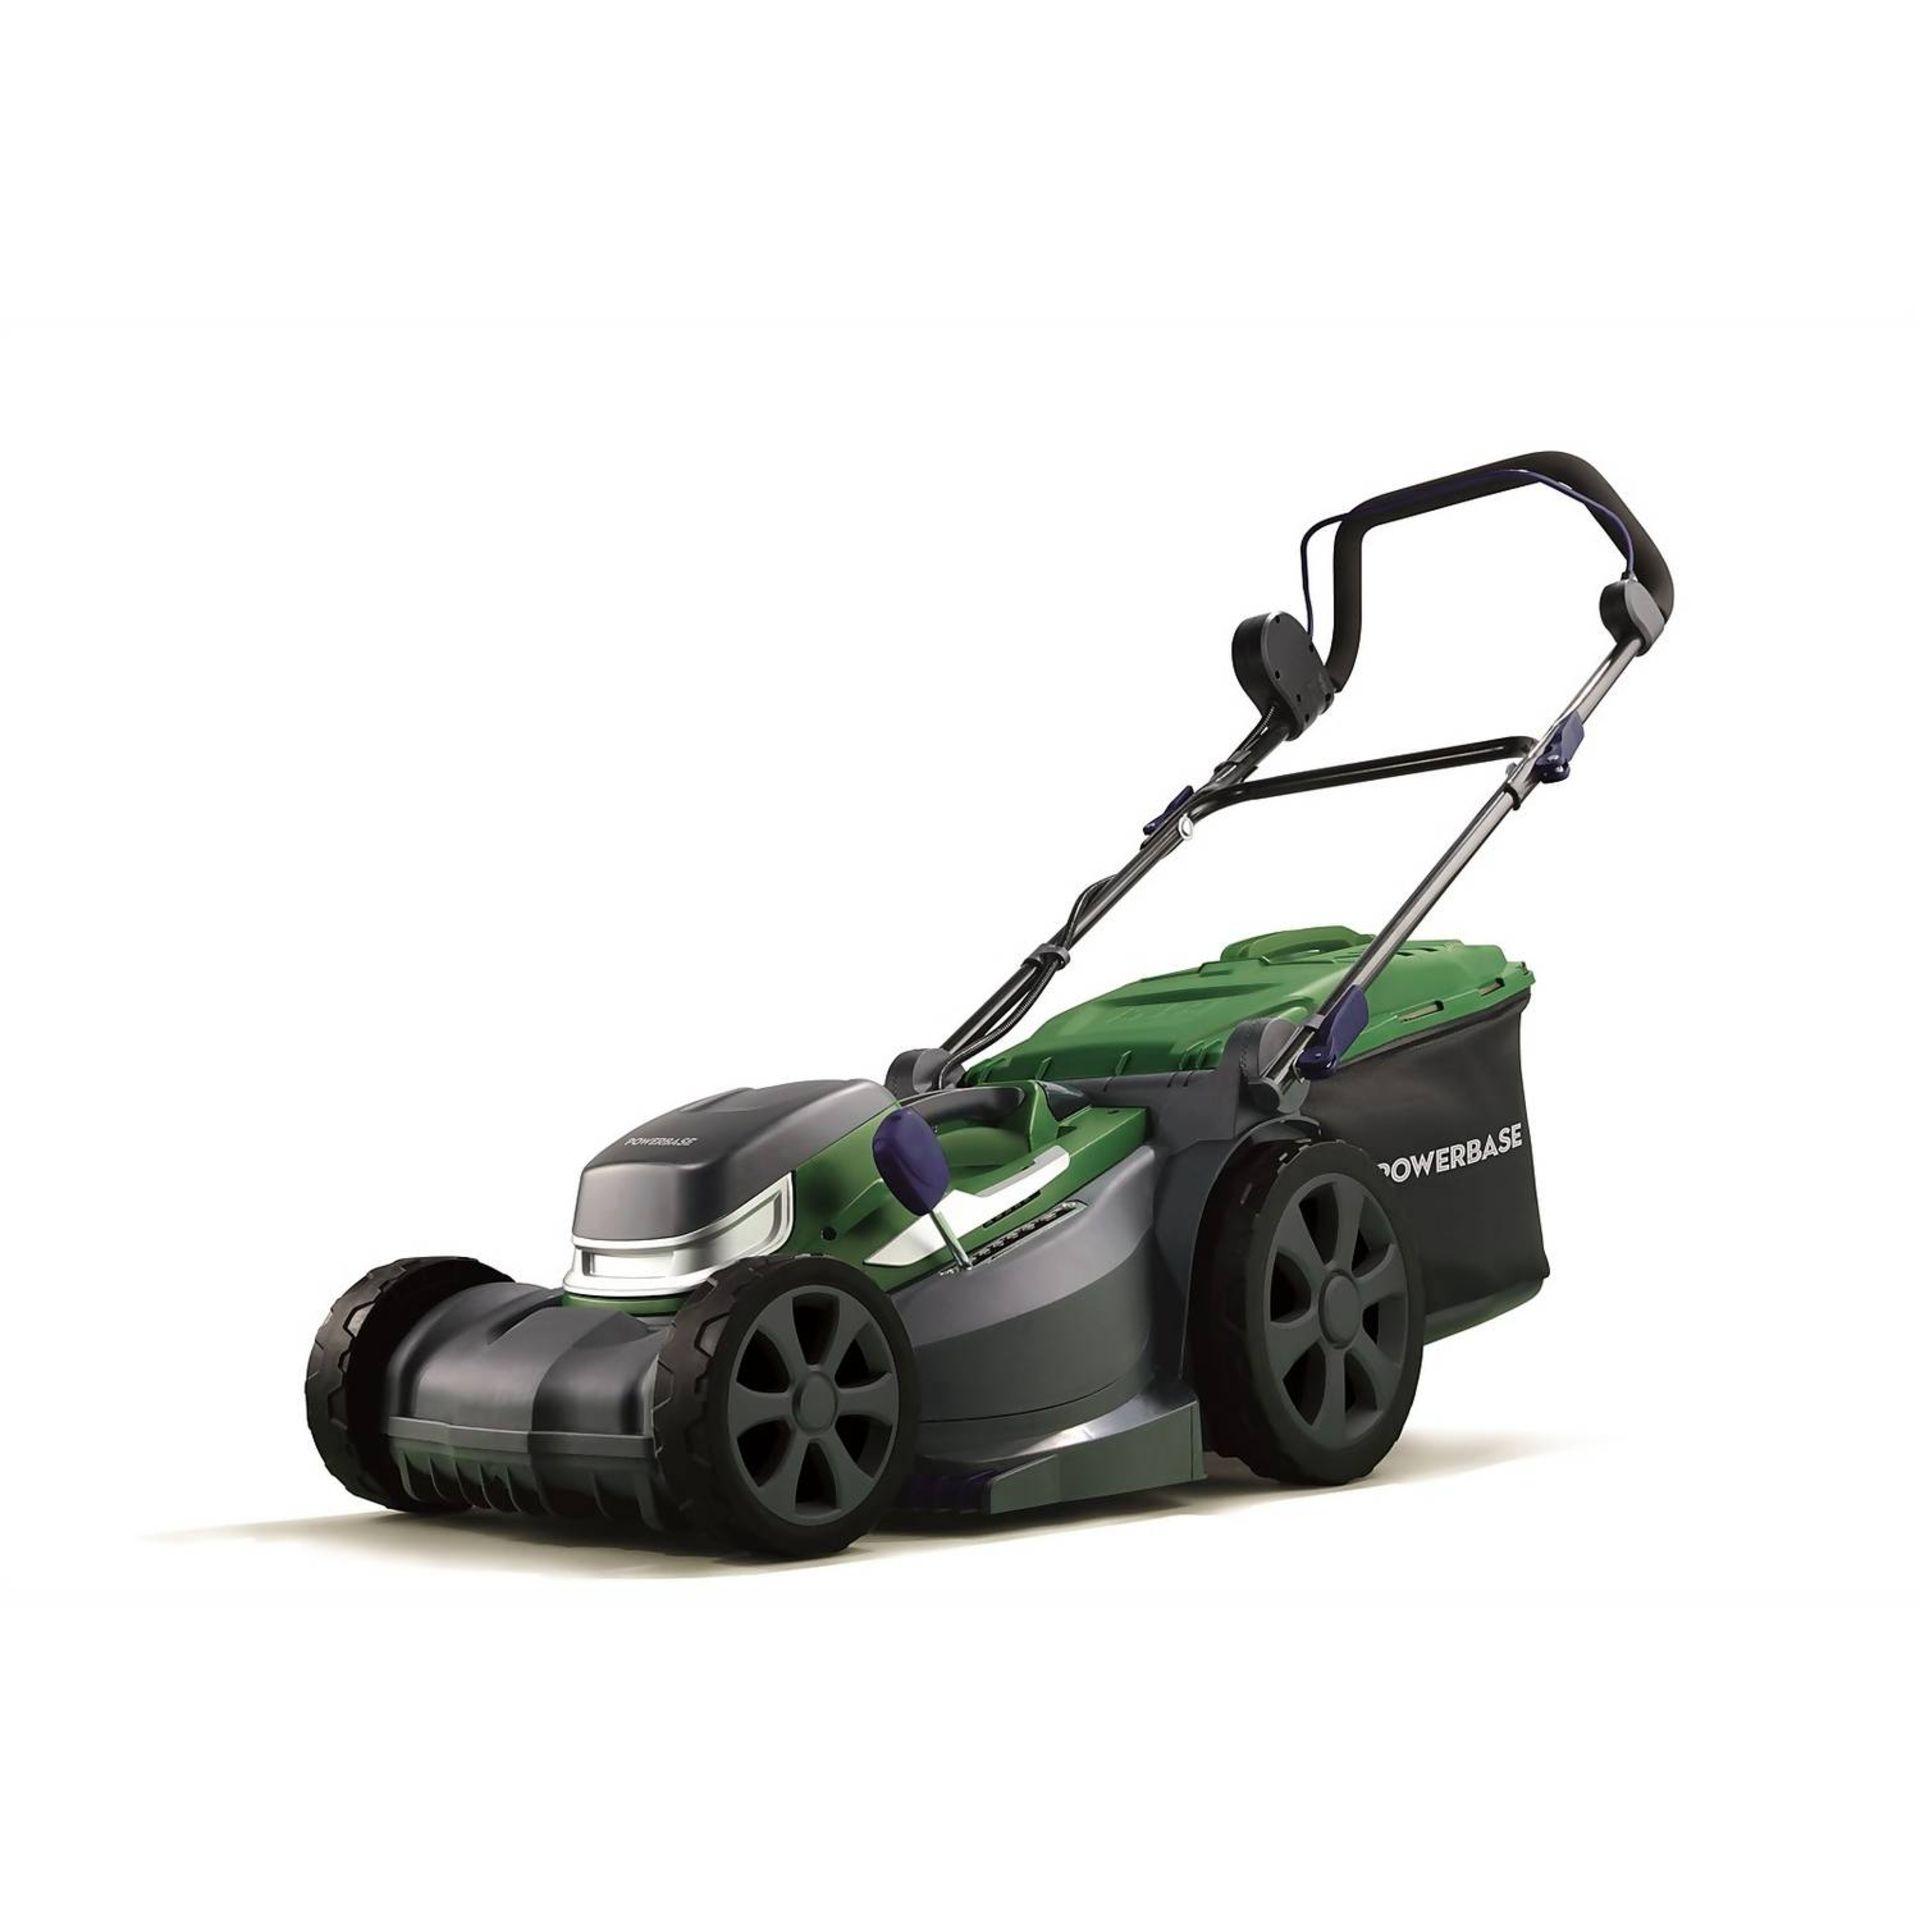 (P9) 1x Powerbase 37cm 40V Cordless Lawn Mower. RRP £199.00. Unit Appears Clean, As New & Unused.